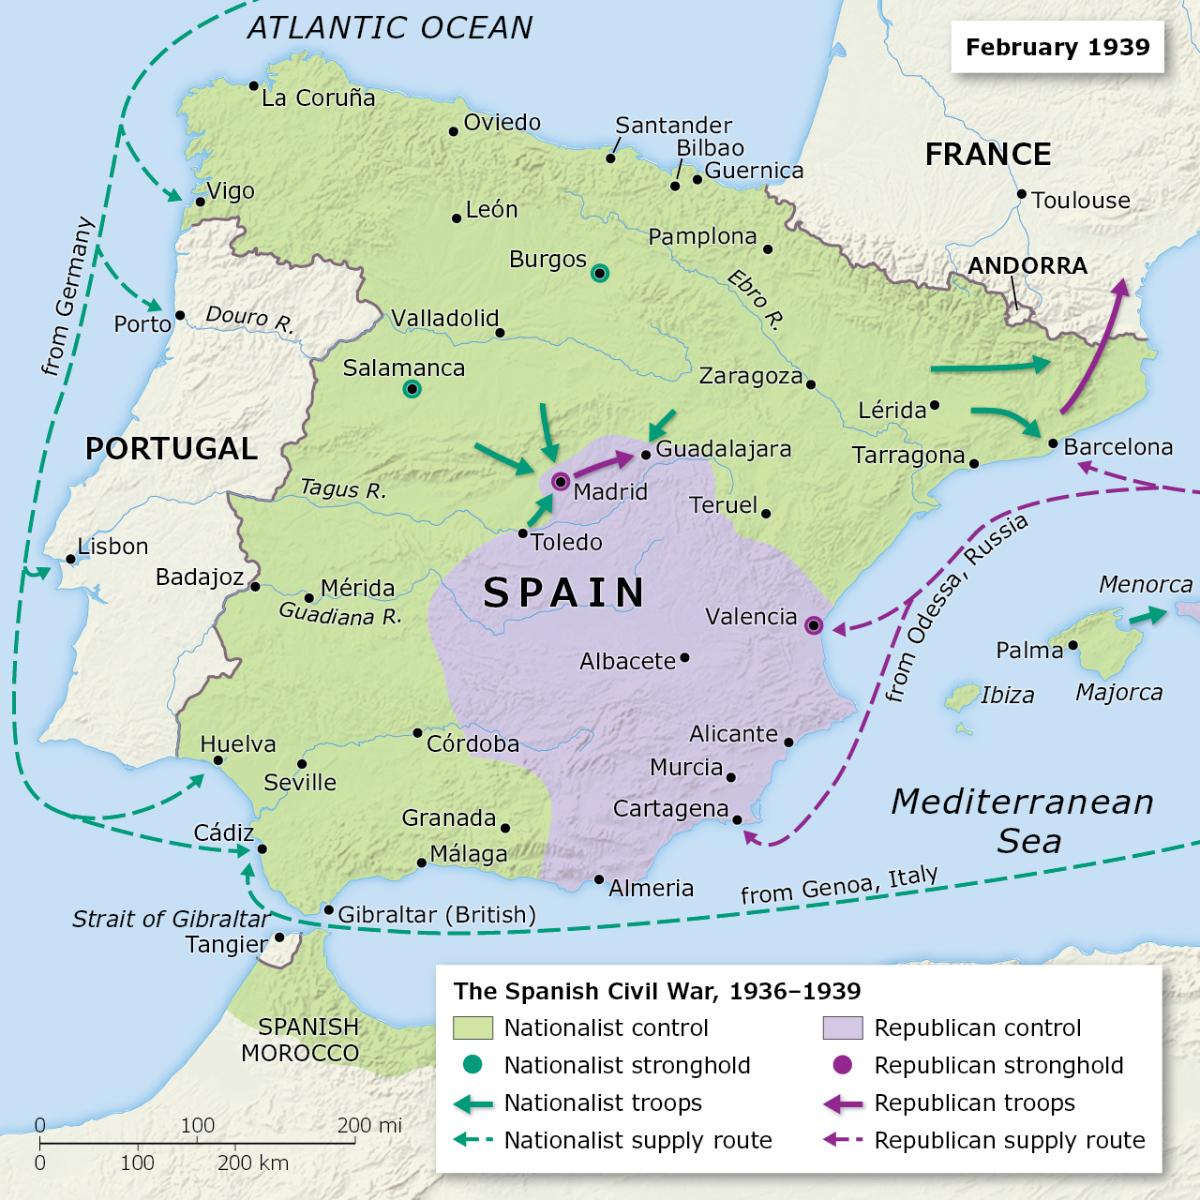 The Spanish Civil War, 1936-1939 - International Mapping